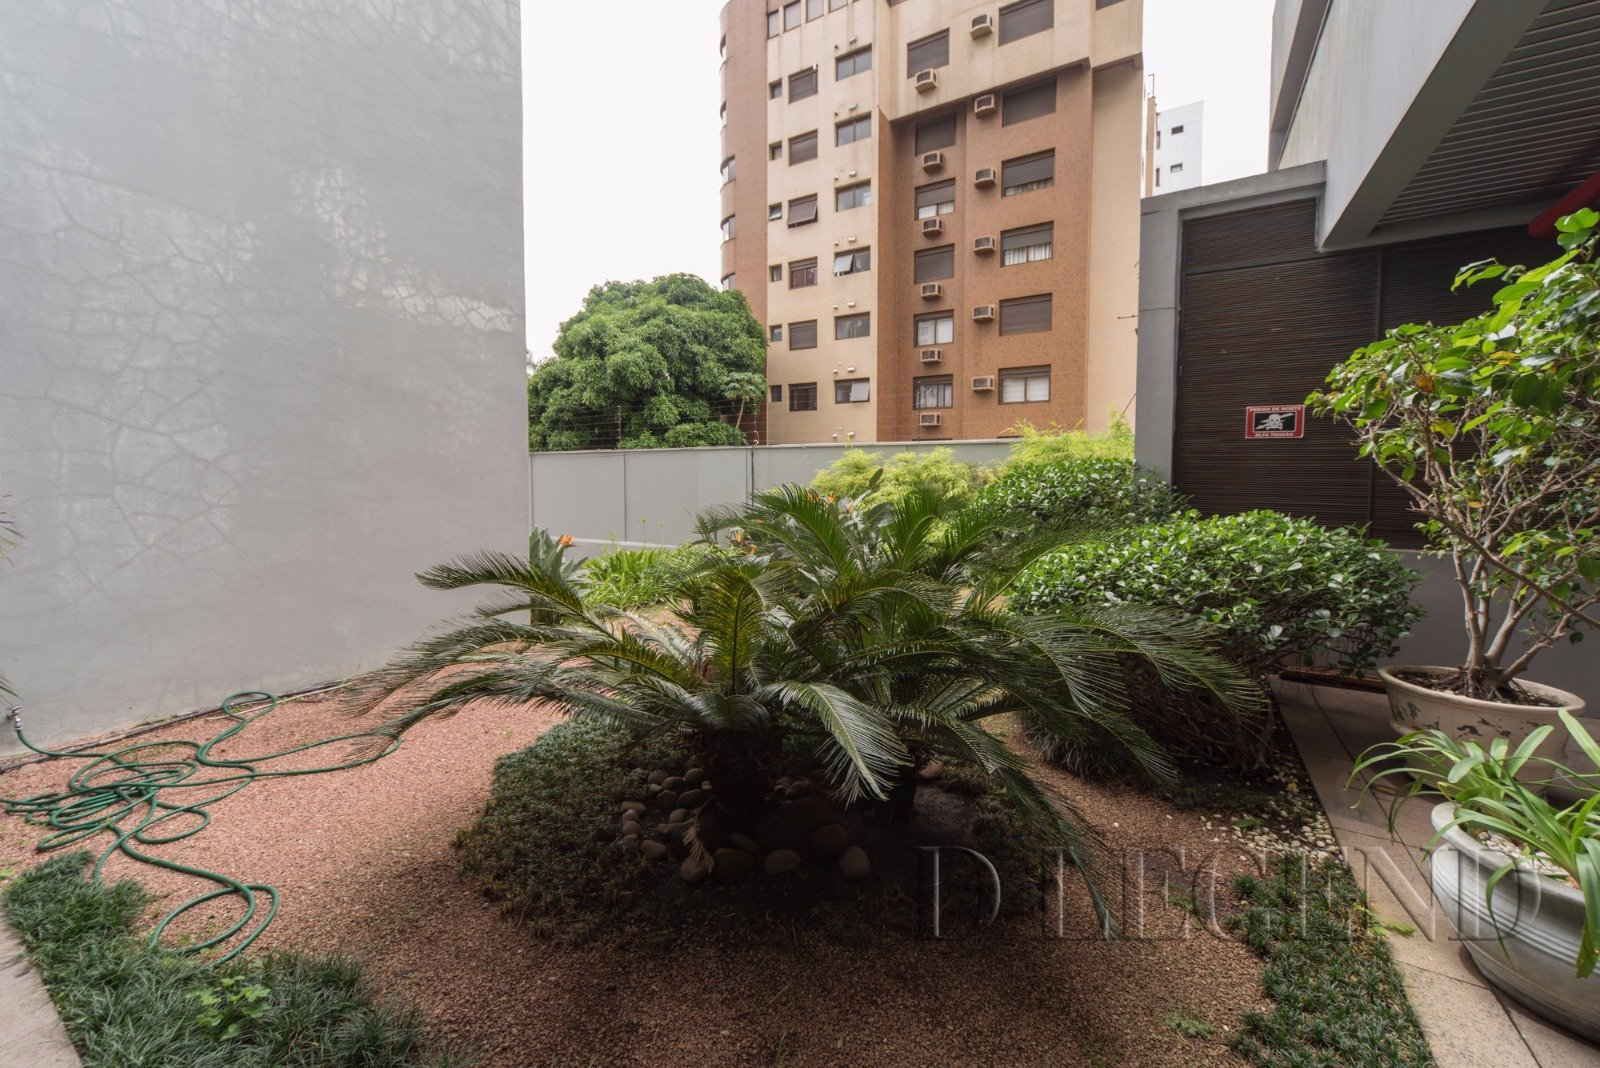 Antares Center - Avenida Carlos Gomes, 141 - Auxiliadora - Porto Alegre